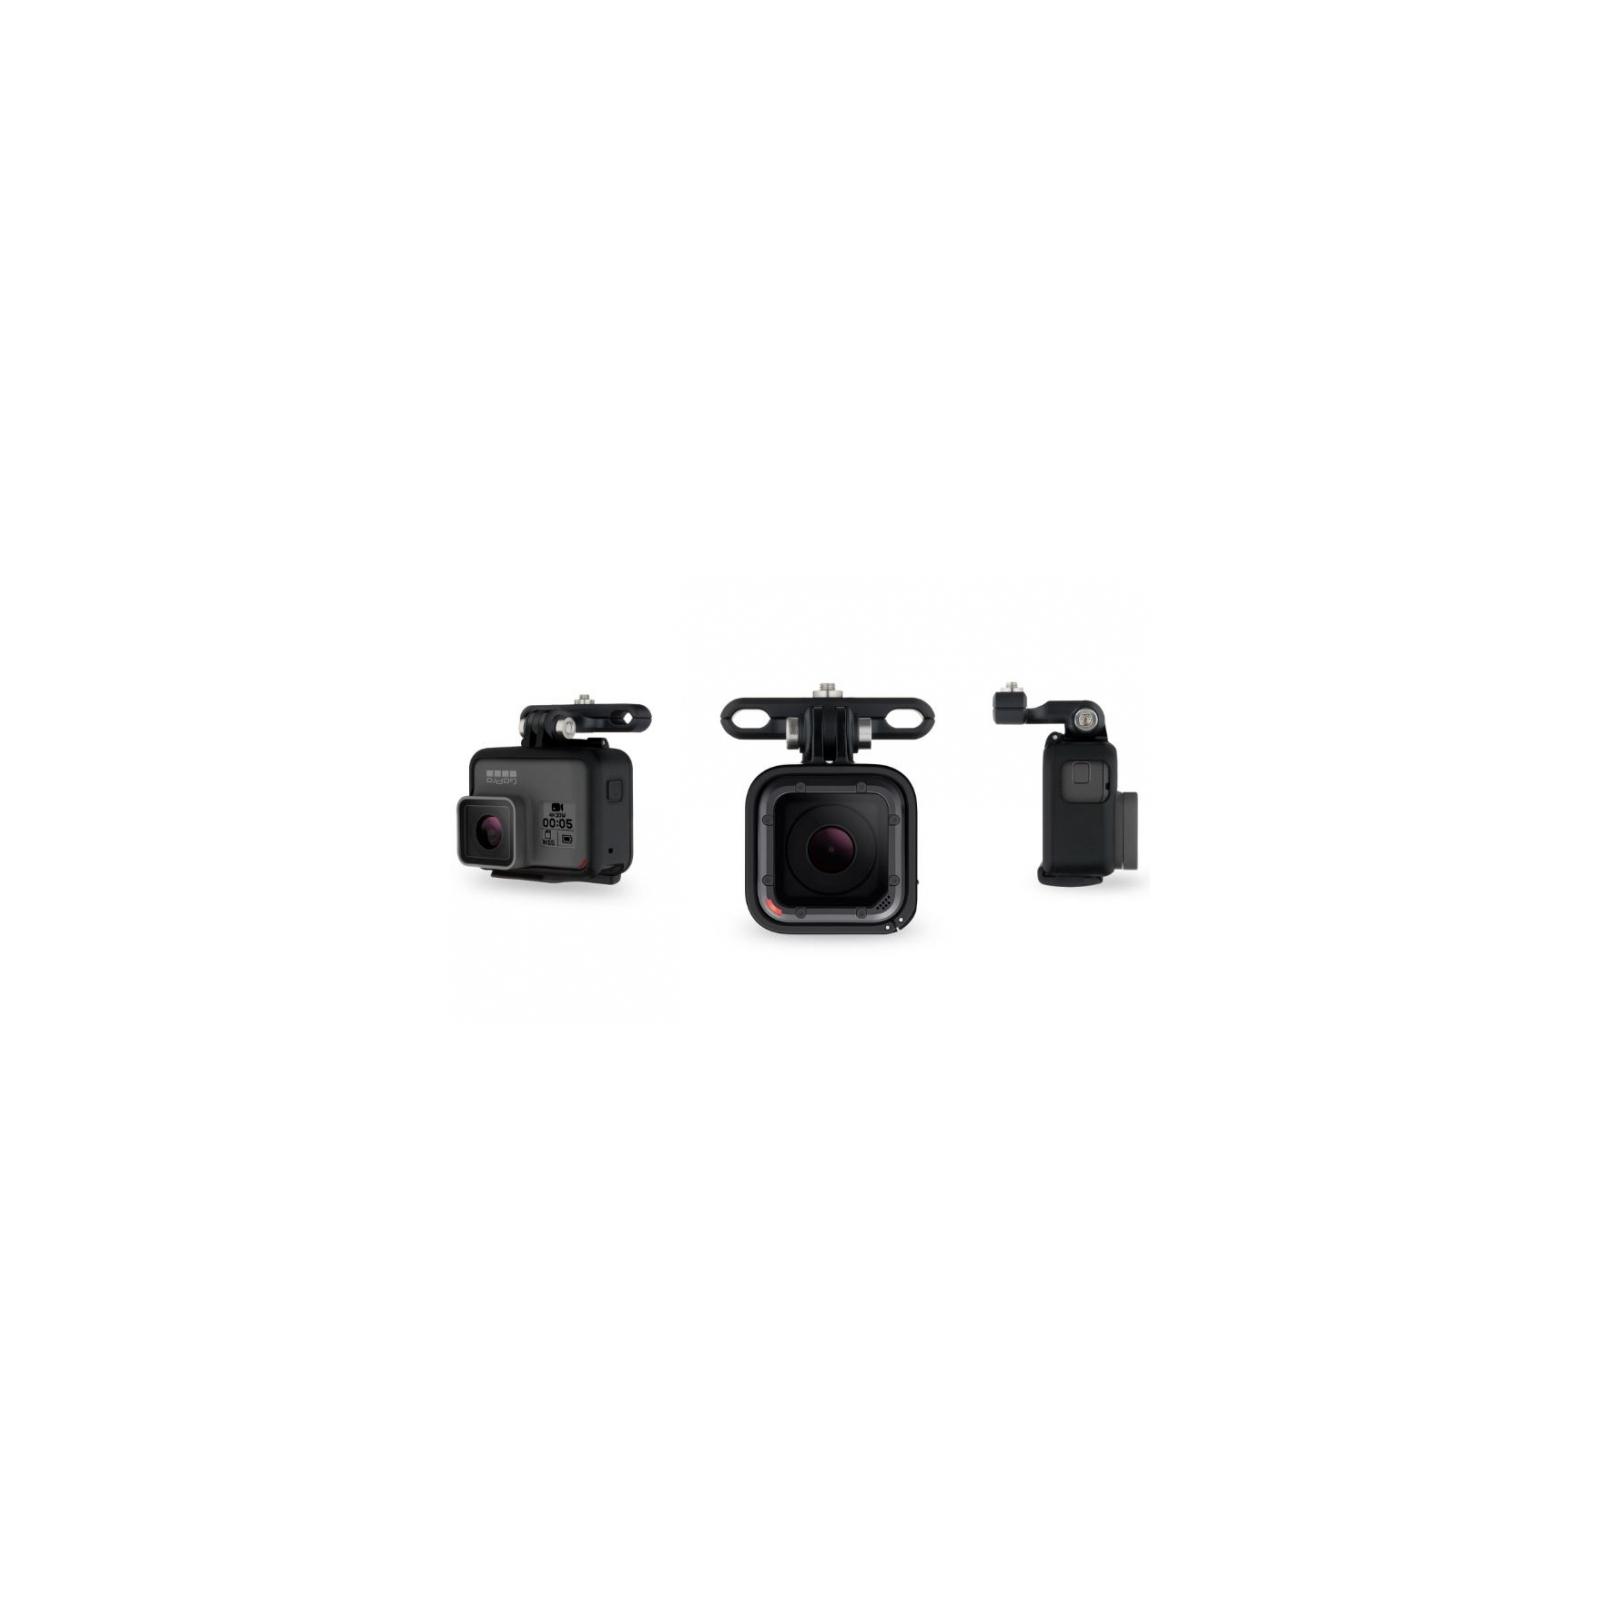 Аксессуар к экшн-камерам GoPro Pro Seat Rail Mount (AMBSM-001) изображение 3